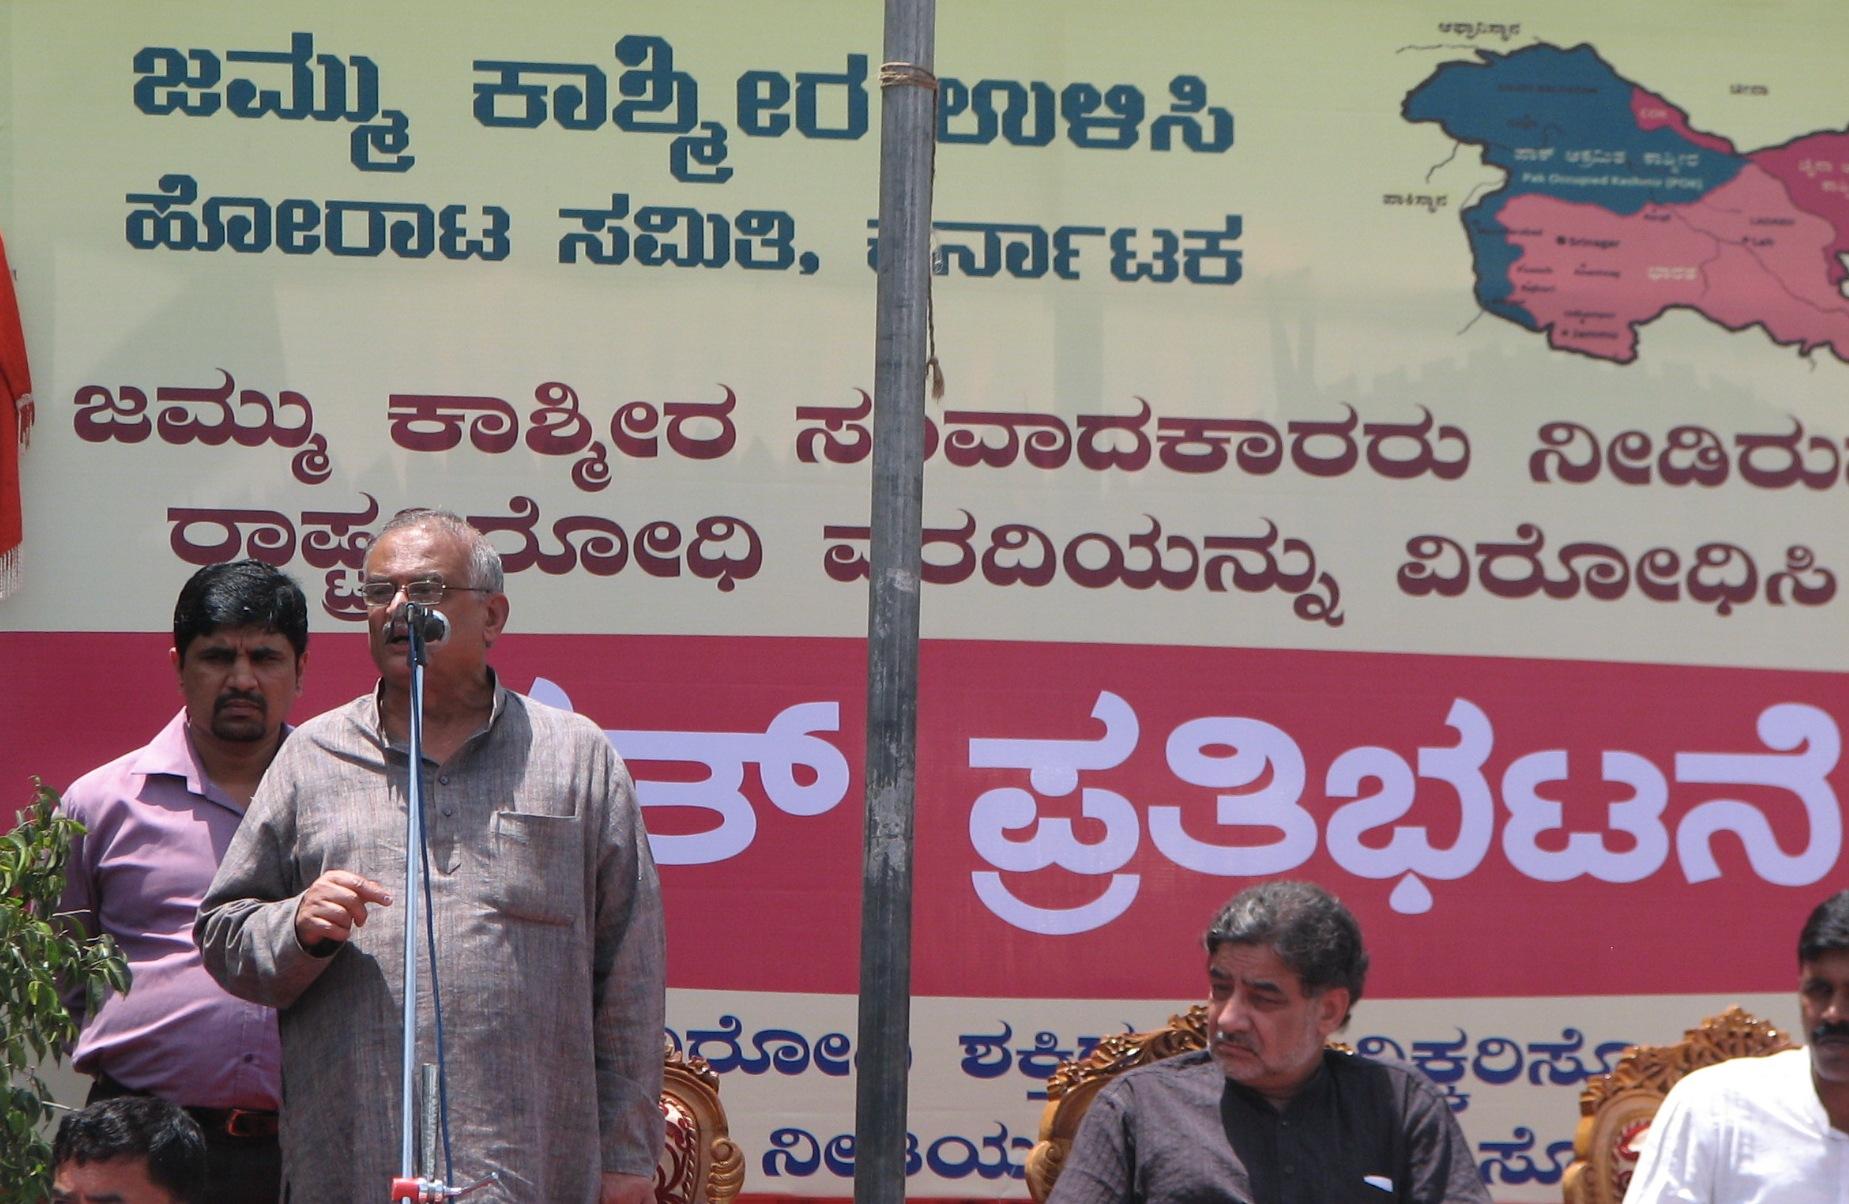 Protest against JK Interlocutors Report at Bangalore July-6-2012